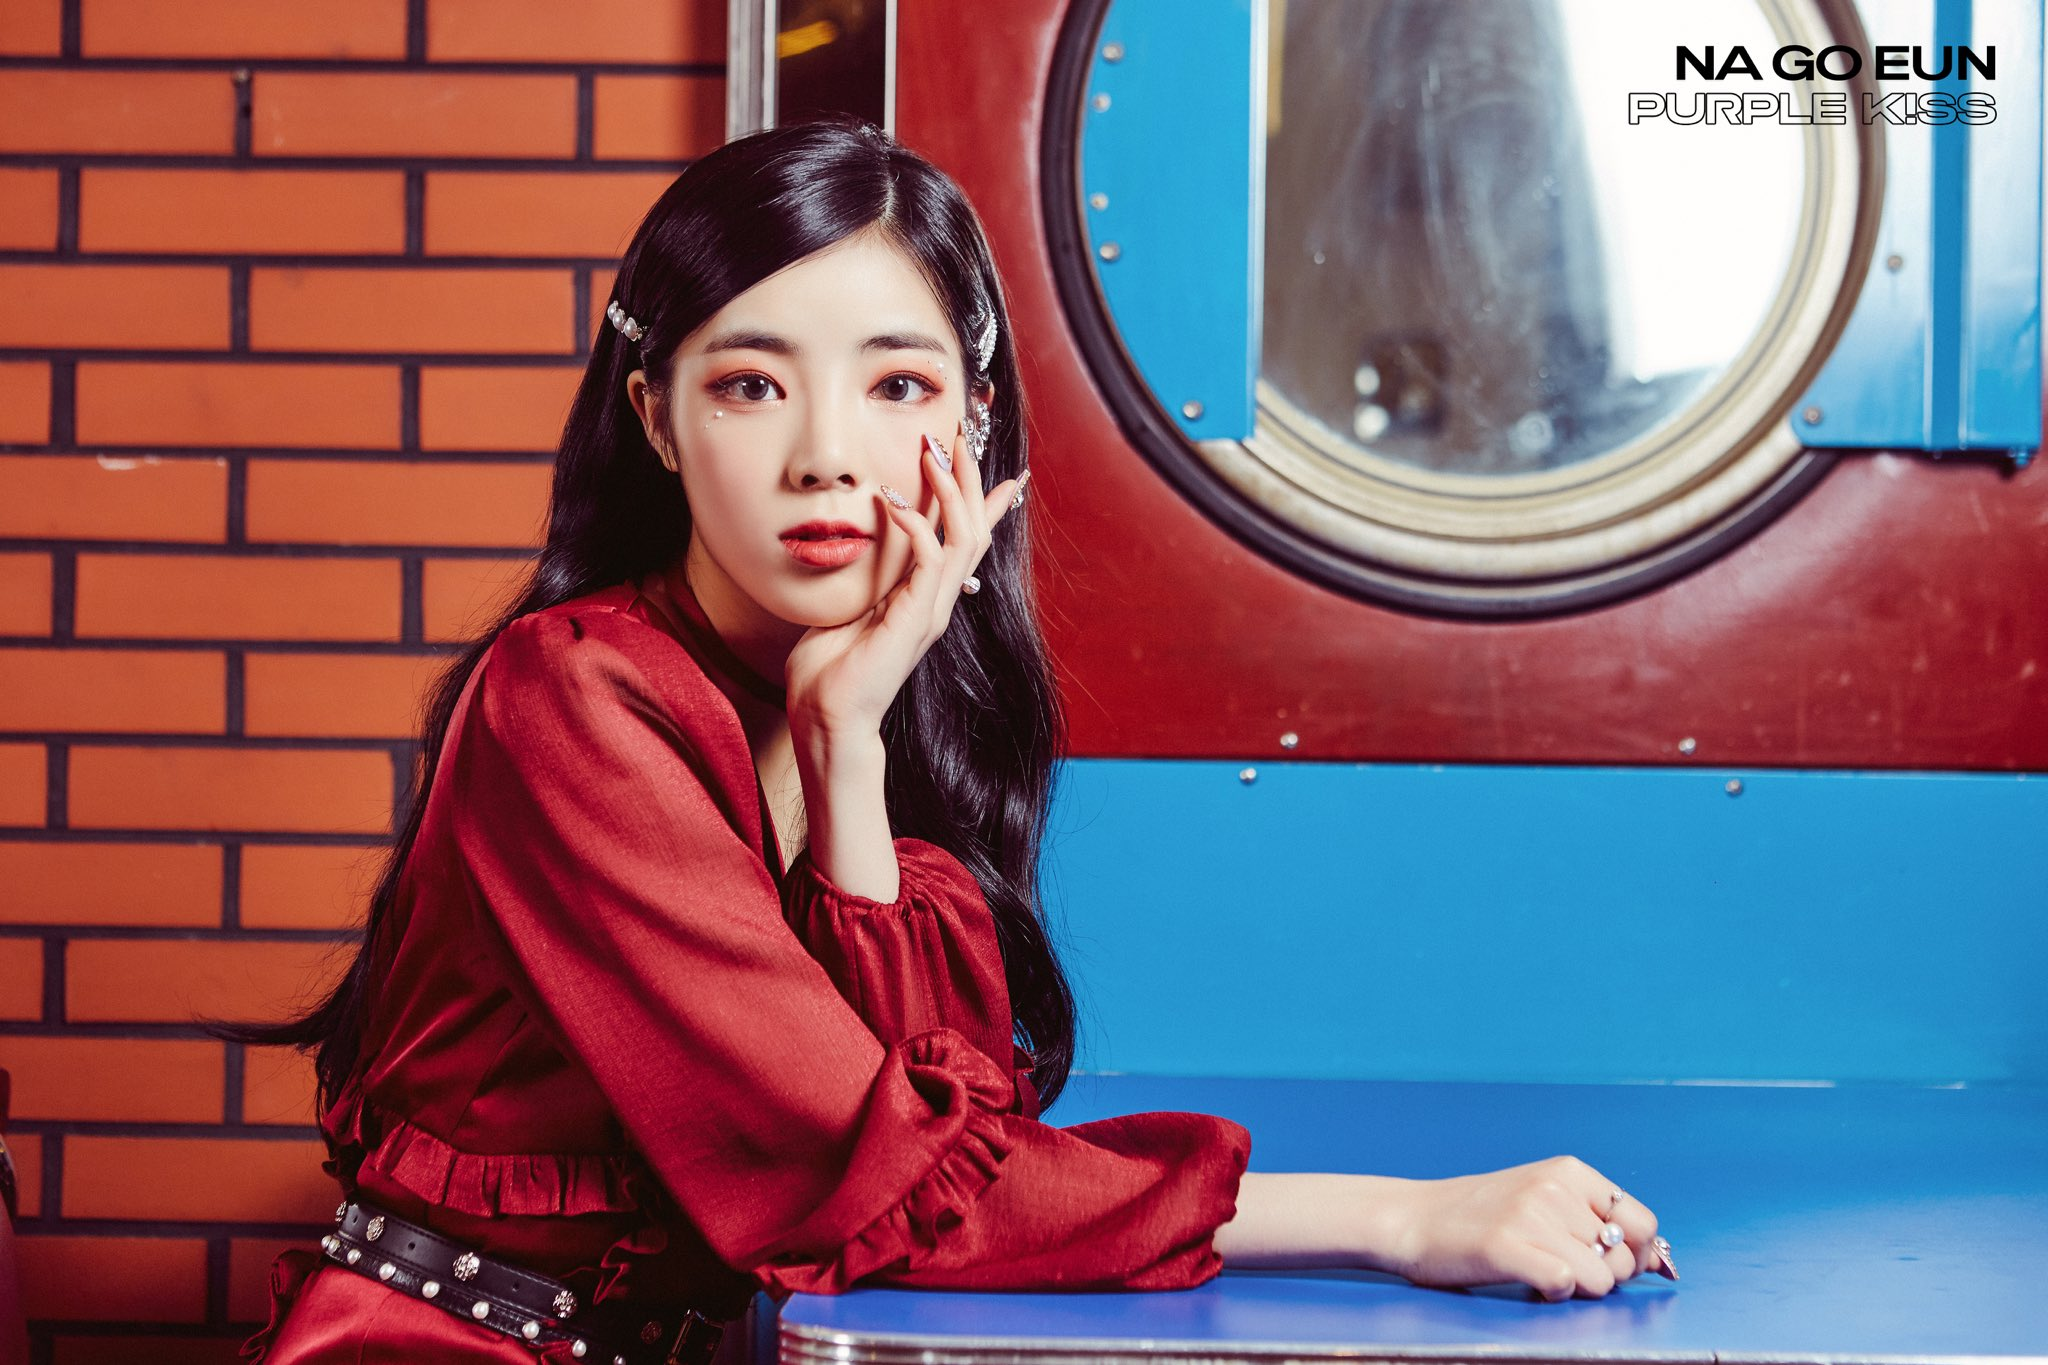 Purple Kiss Na Goeun Debut Teaser Photos (HQ/HD)